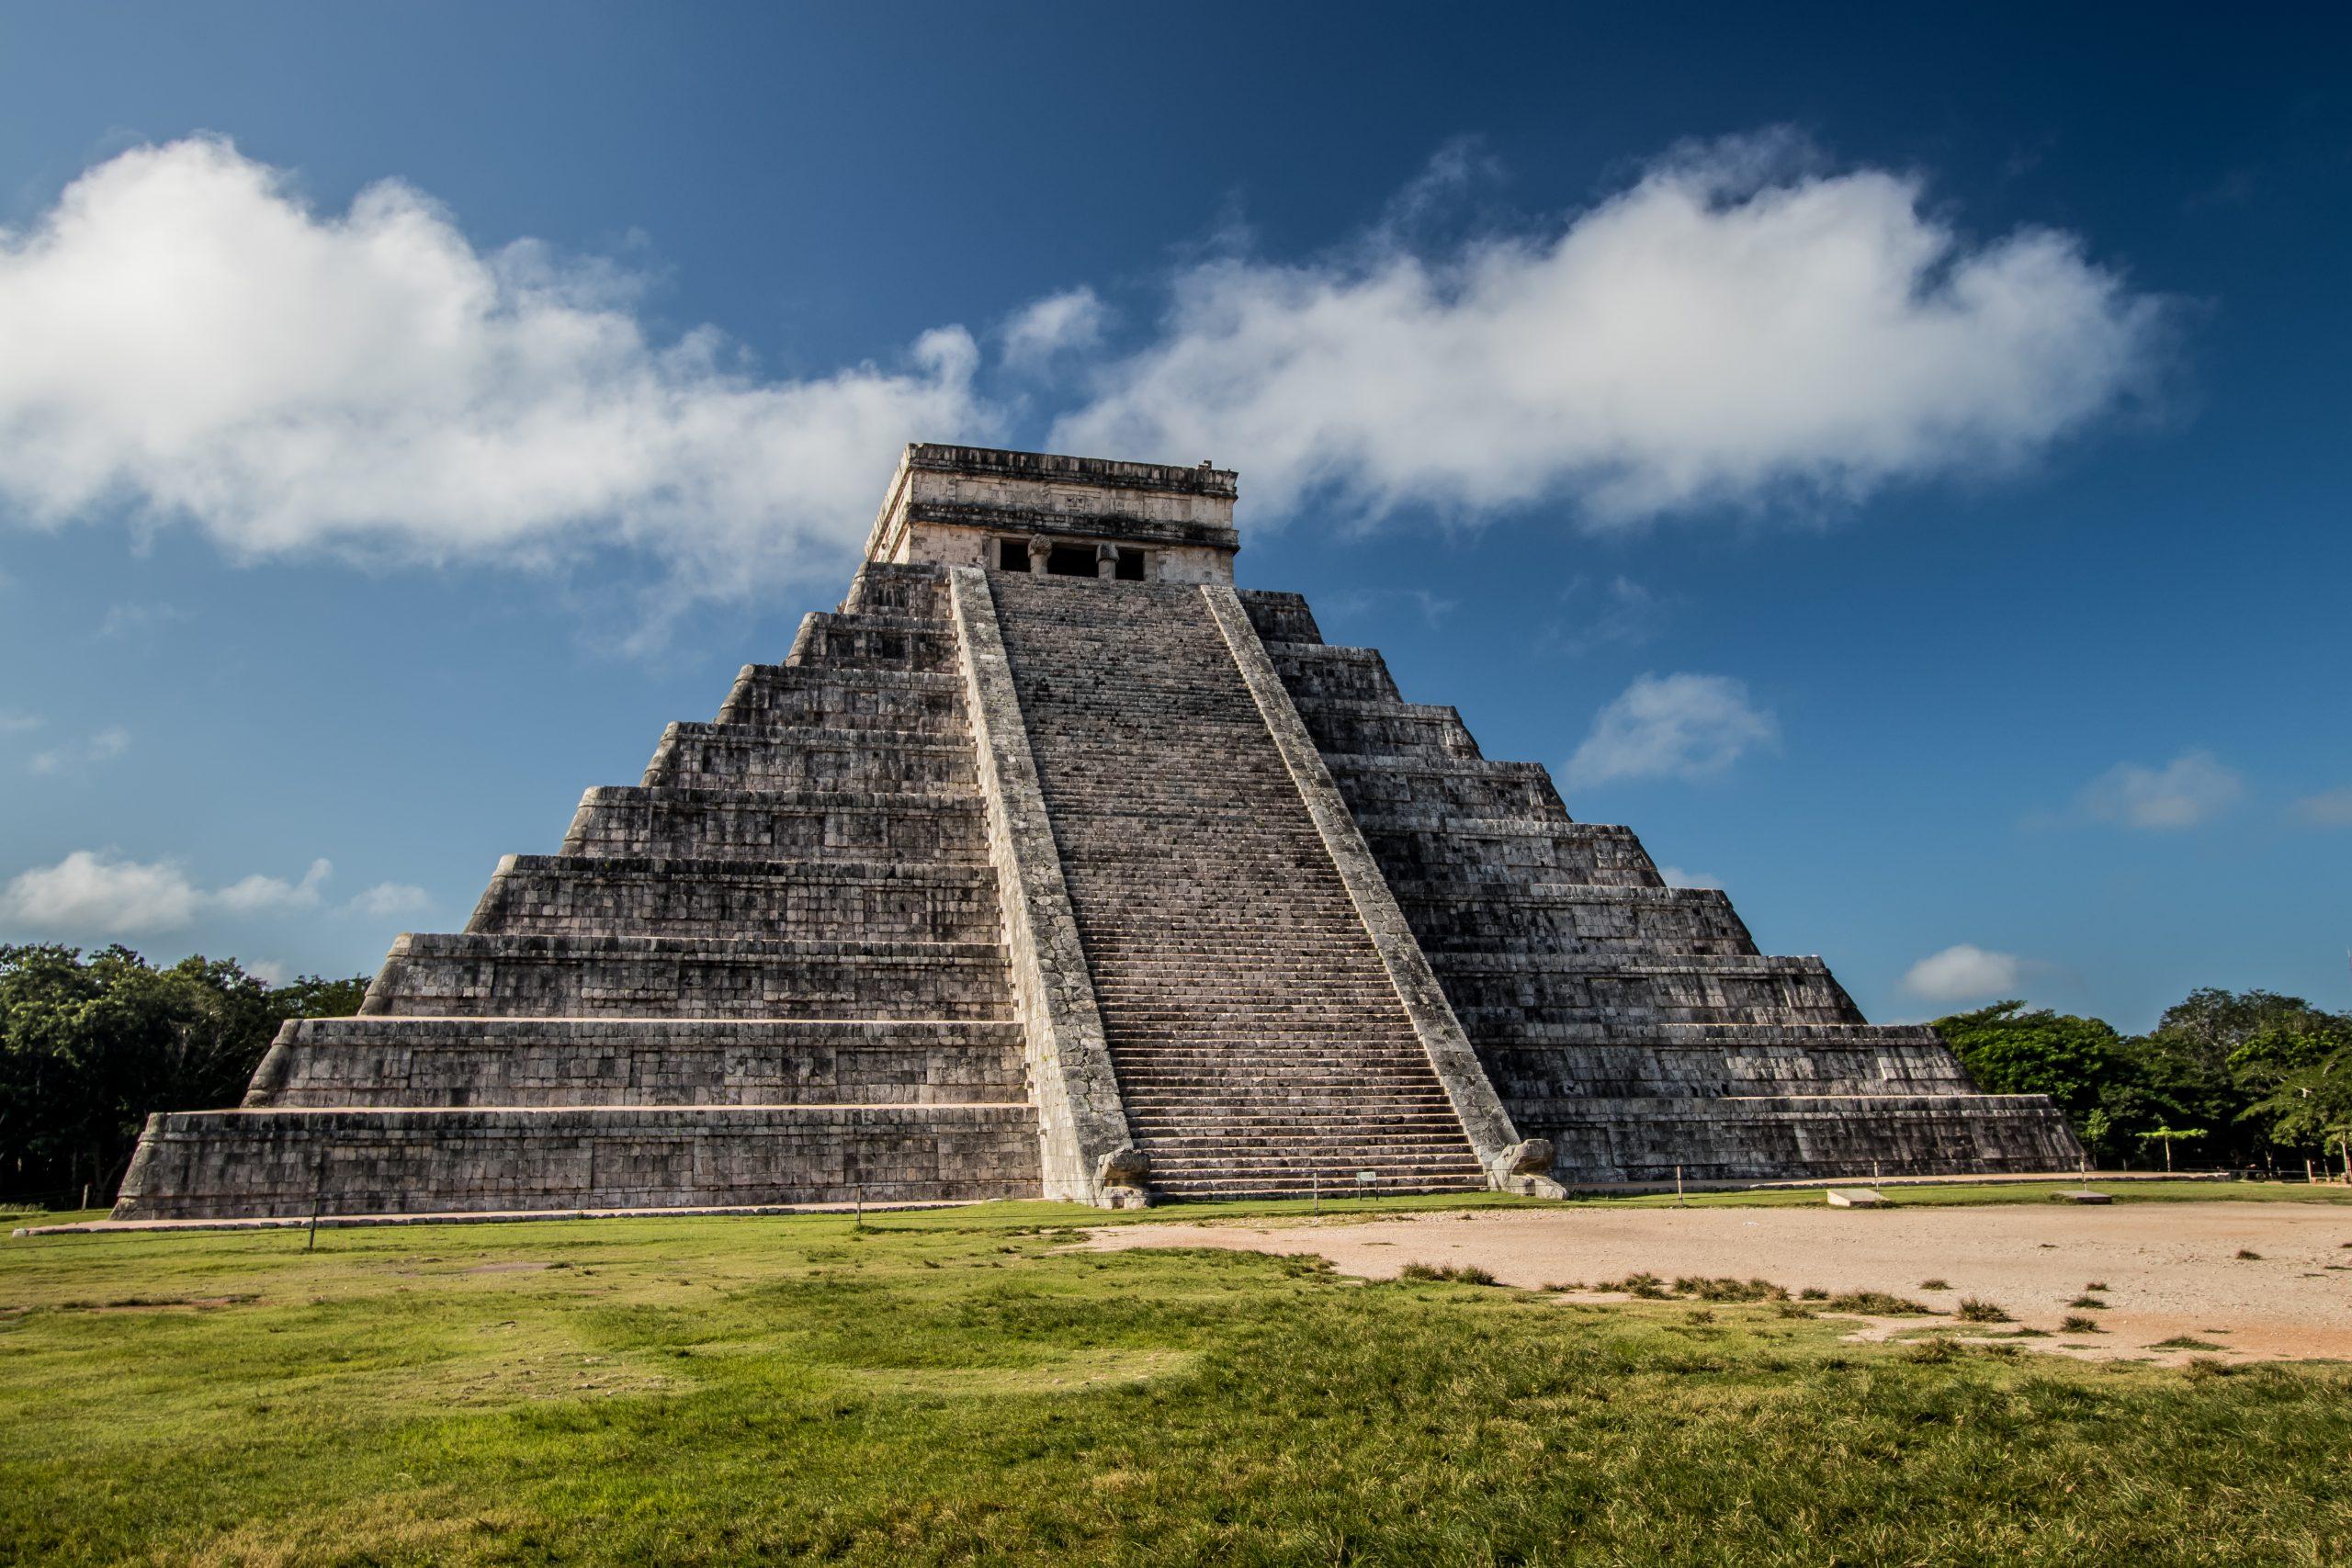 Chichen Itza - Merveille du monde Mexique - Marie Naudon